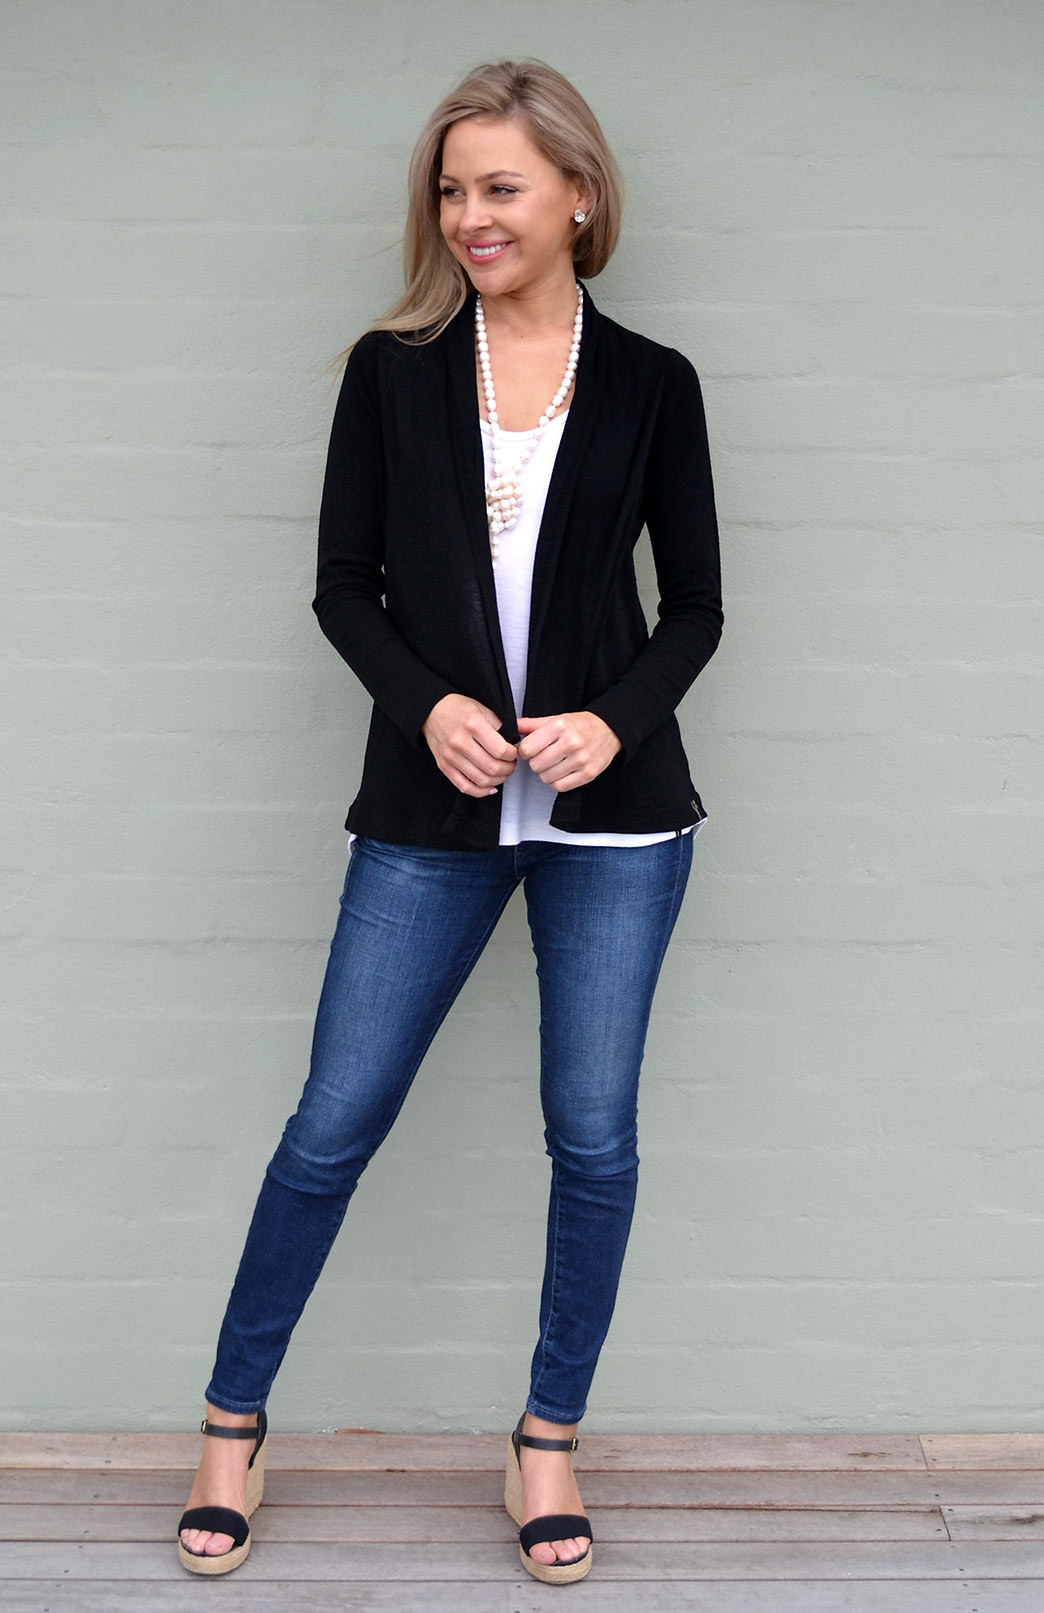 Mini Drape Cardigan - Women's Black Merino Wool Maternity Drape Cardigan - Smitten Merino Tasmania Australia